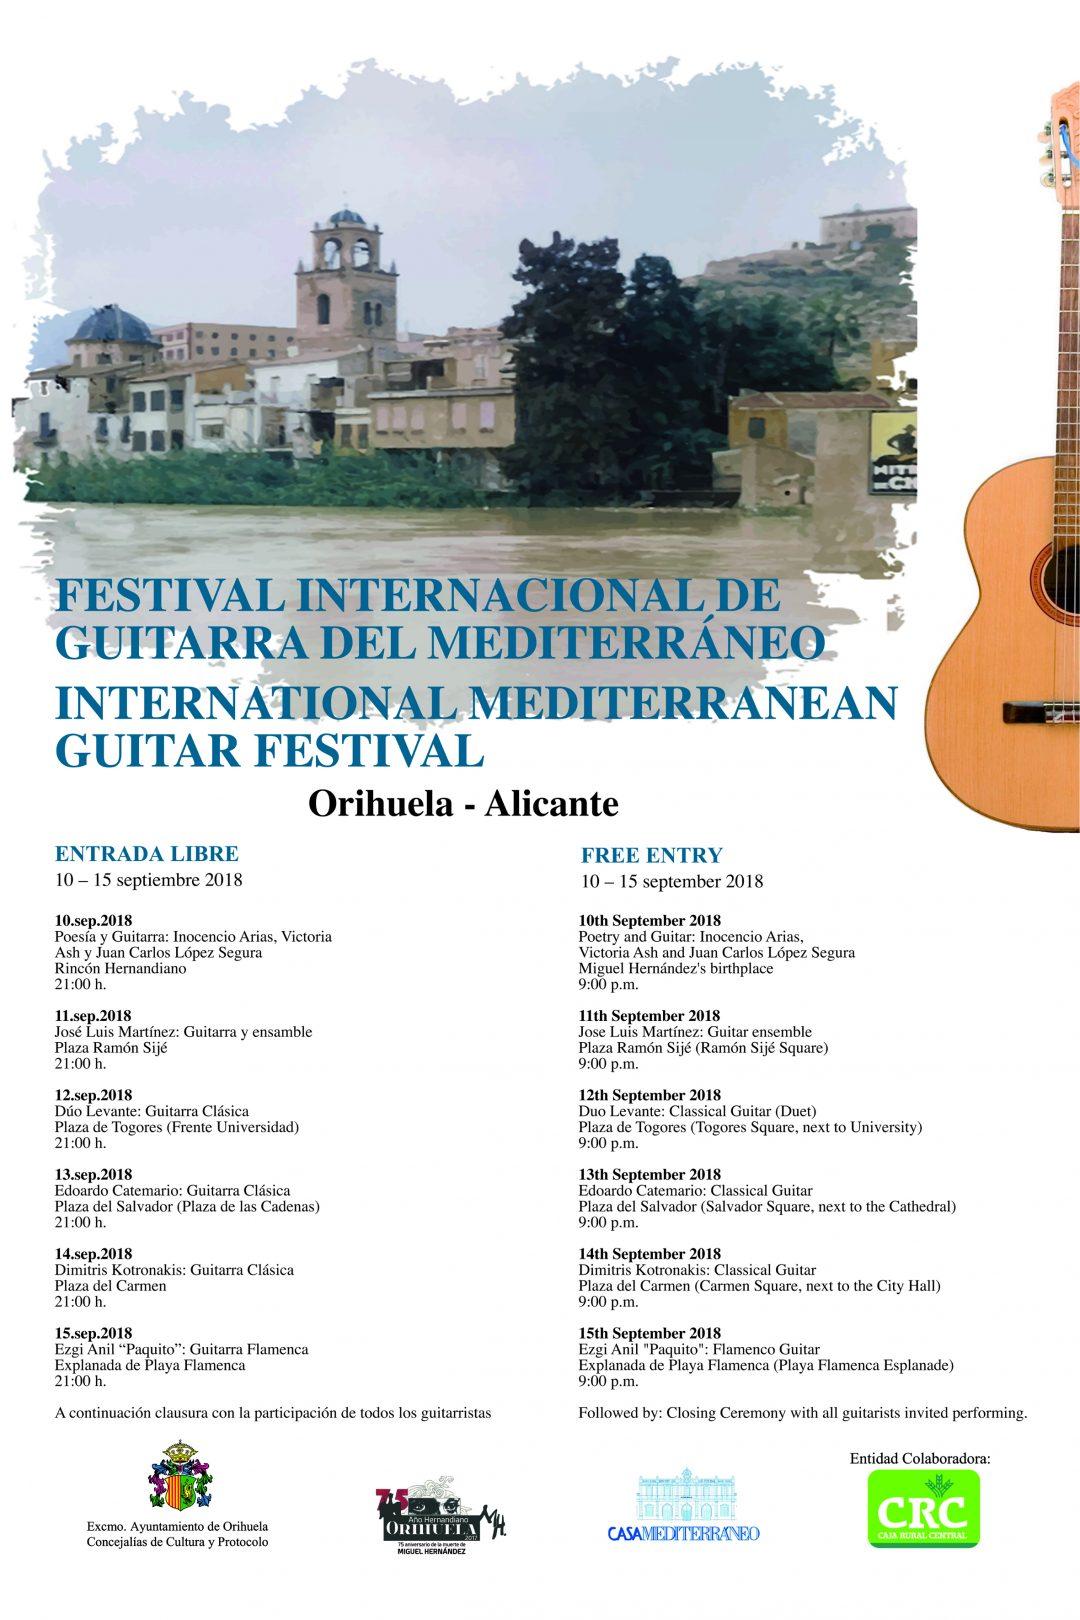 Festival Internacional de Guitarra del Mediterráneo